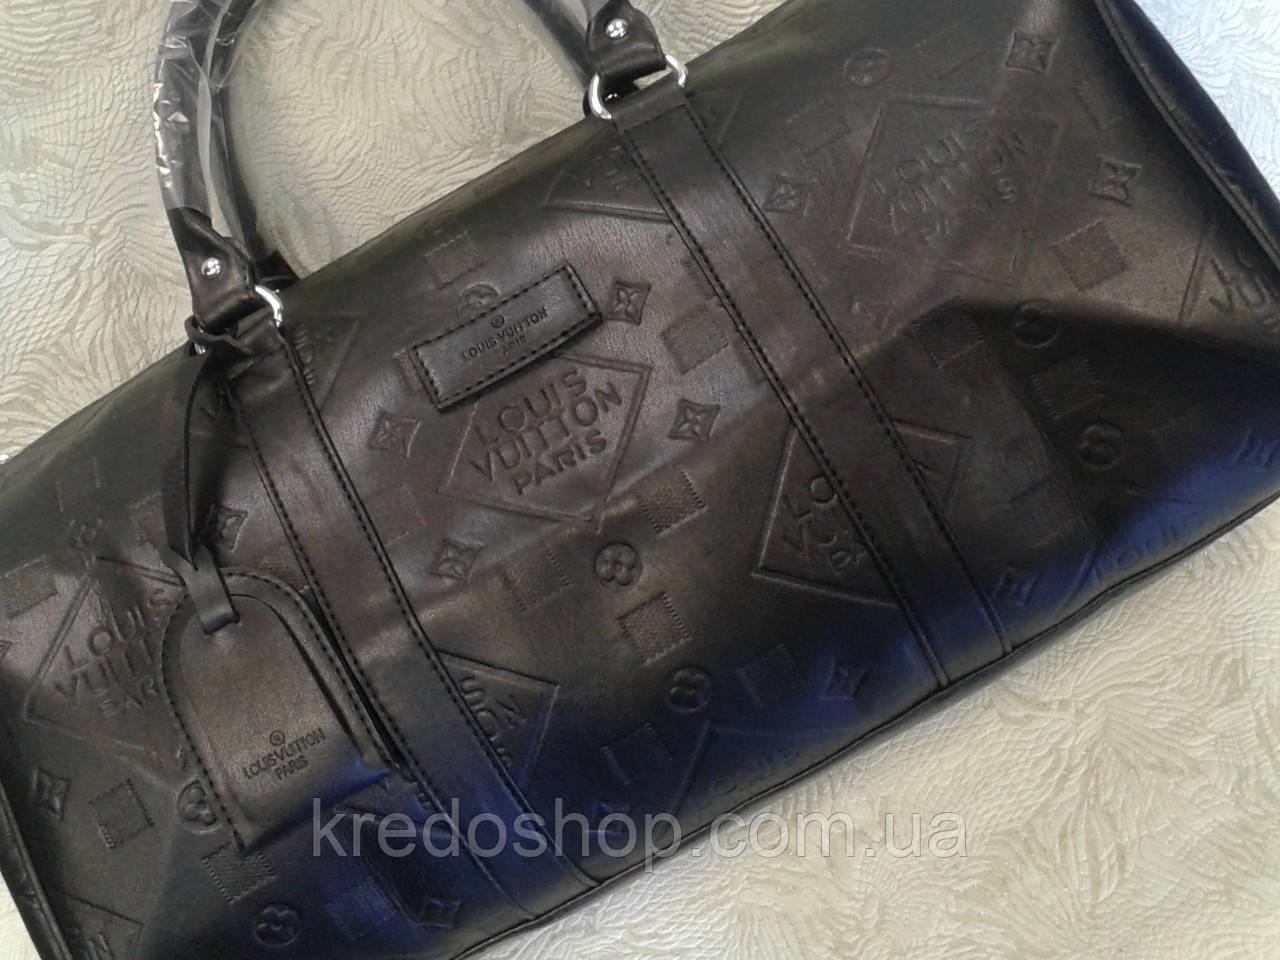 b1343b67c26e Сумка баул черный аналог Louis Vuitton - Интернет-магазин сумок и  аксессуаров